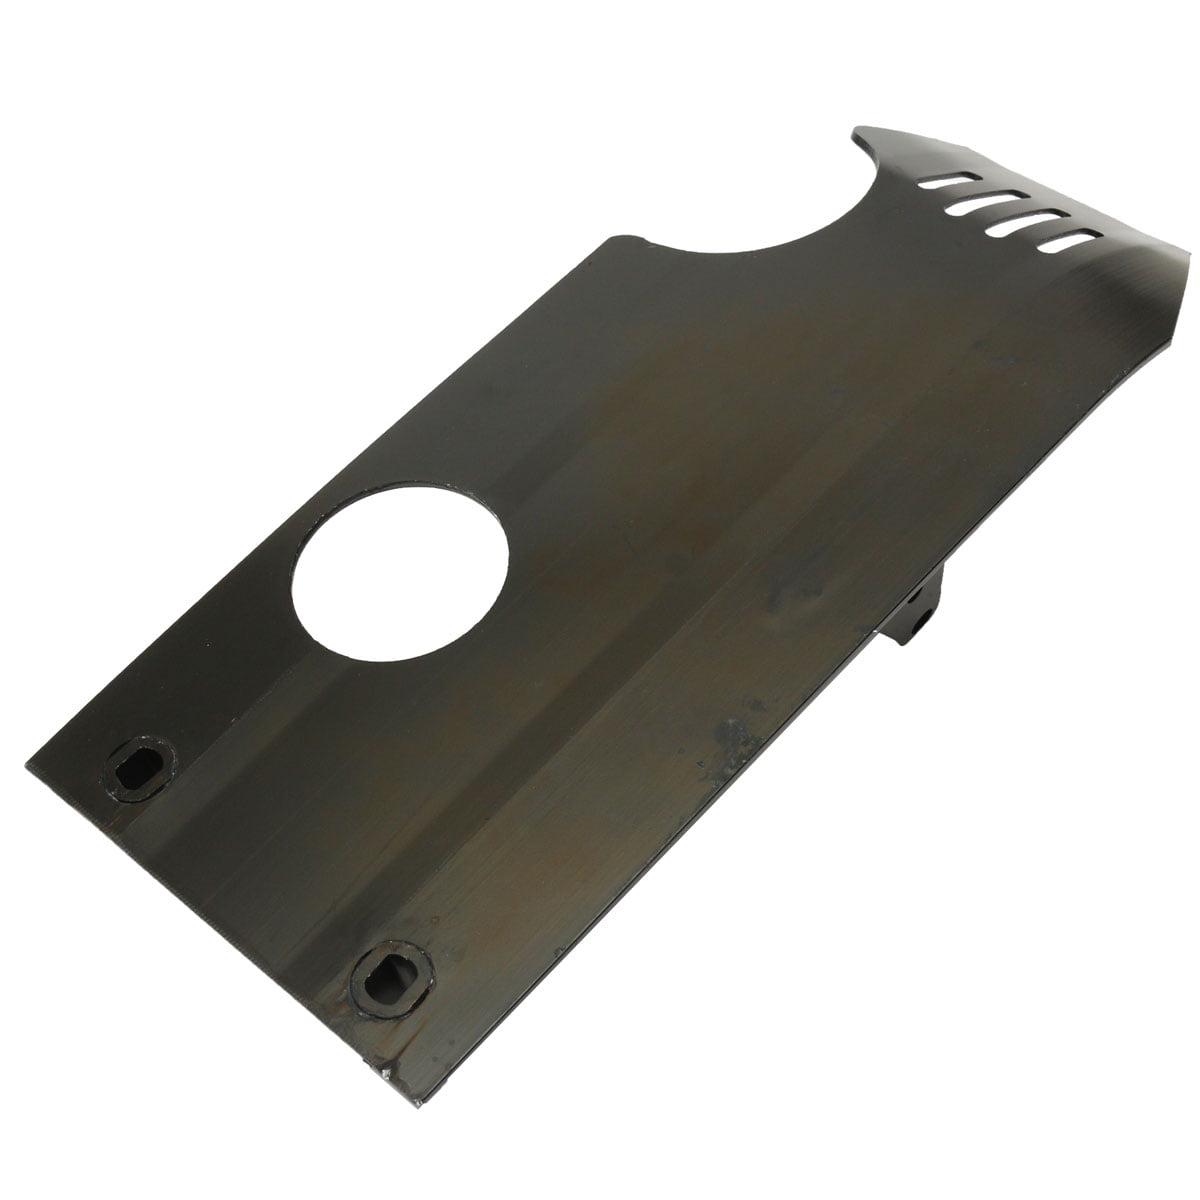 Black Pit Bike Skid Plate Engine Motor Protect For Honda CRF50 XR50 CRF70 XR 50